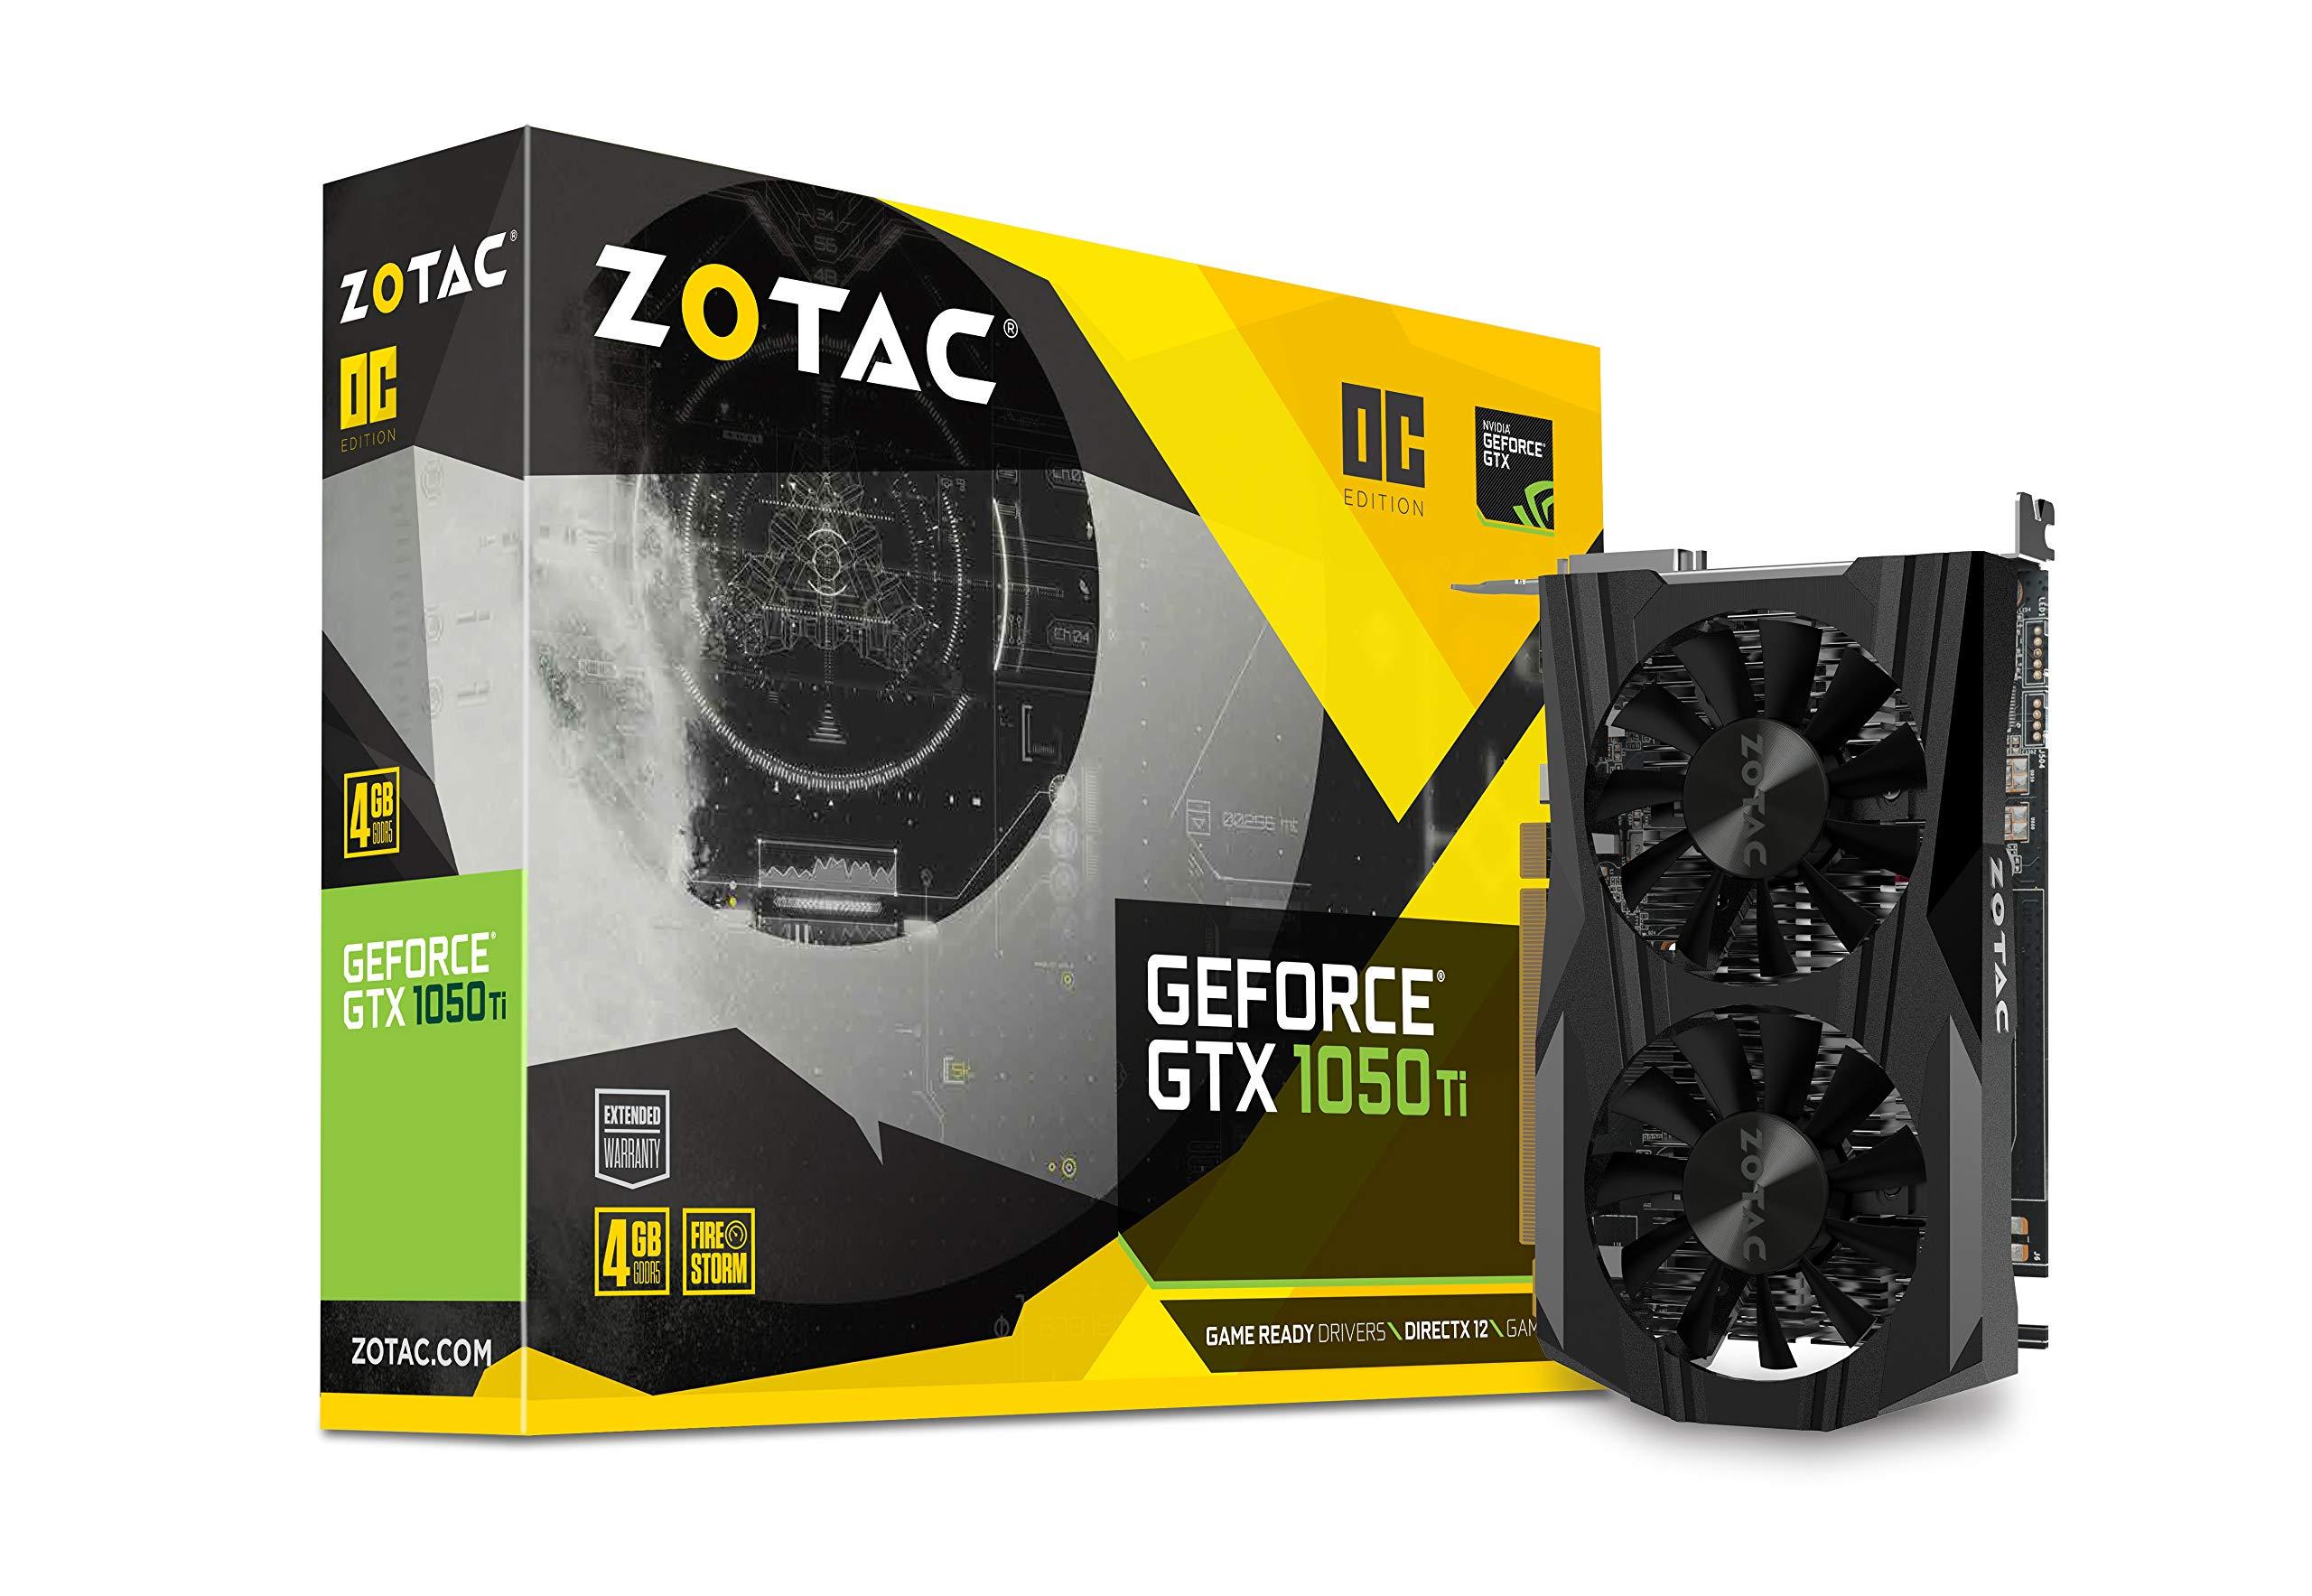 d51c5ce450c400 Zotac ZT-P10510B-10L Scheda Video Gaming, GeForce GTX 1050 Ti 4GB GDDR5